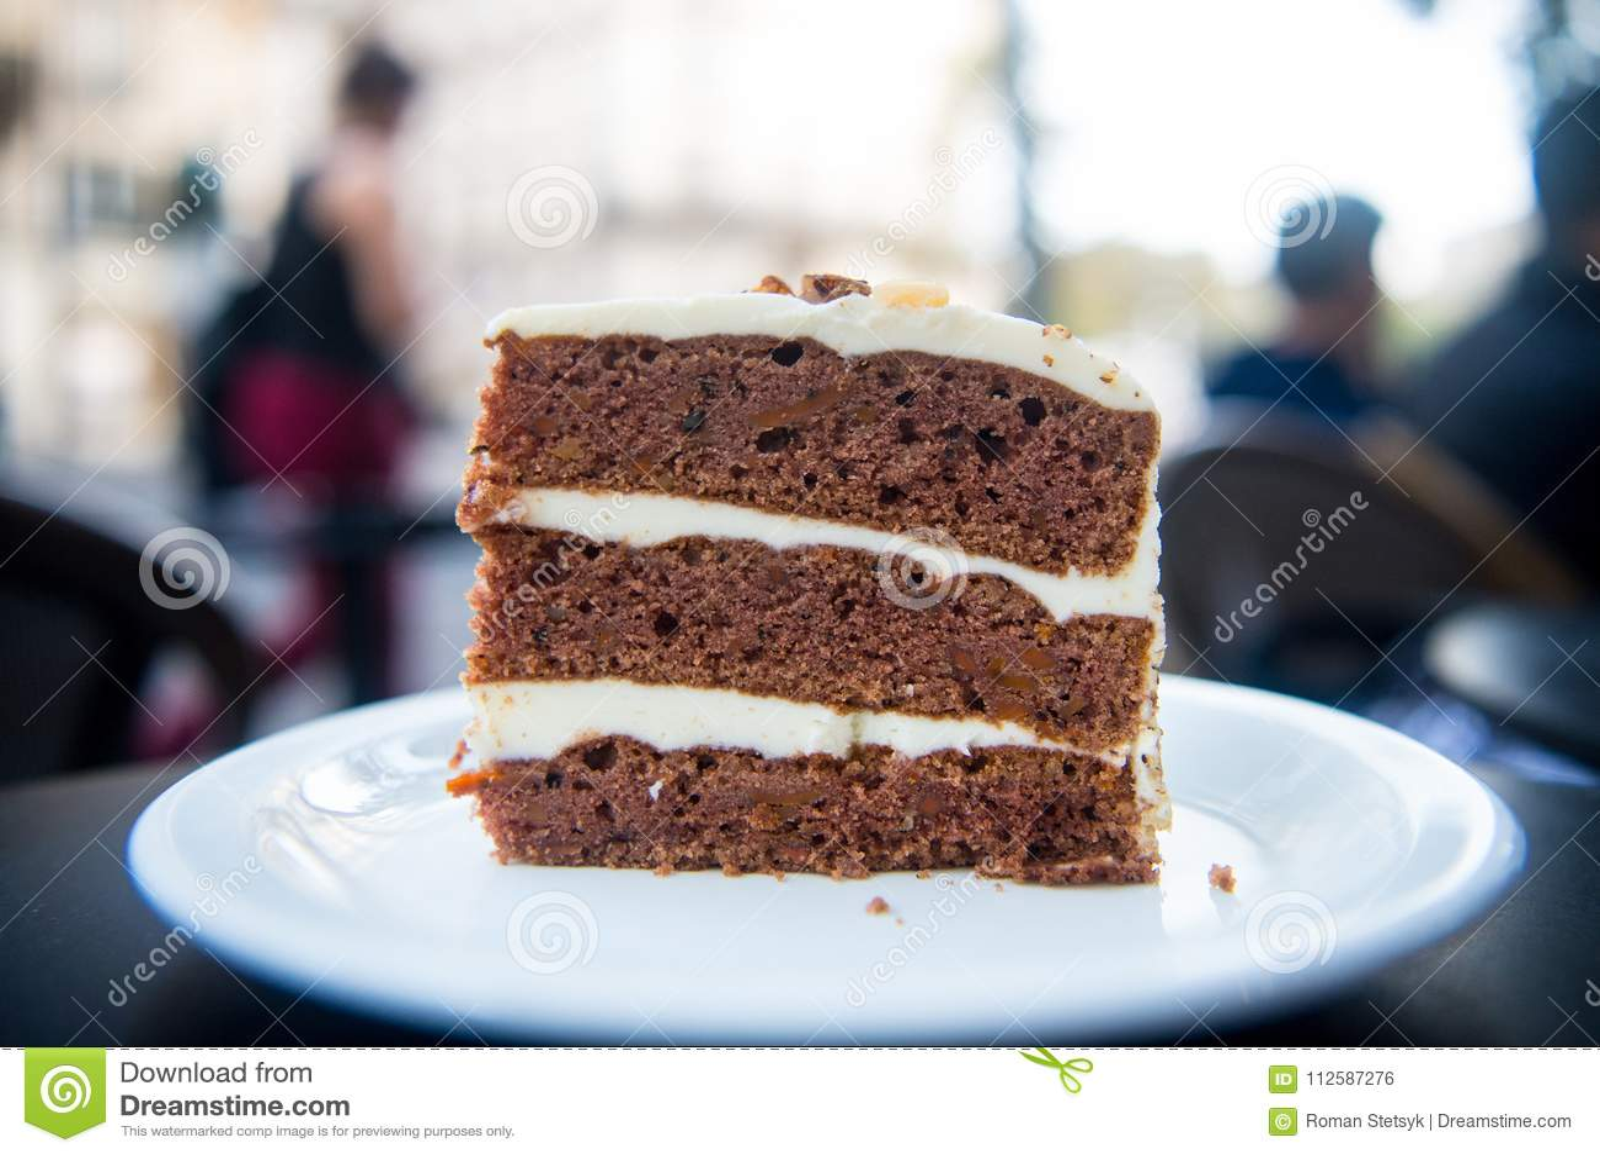 Cake slice on white plate in paris, france, dessert. Cake with cream, food. Temptation, appetite concept. Dessert, food, snack, pa